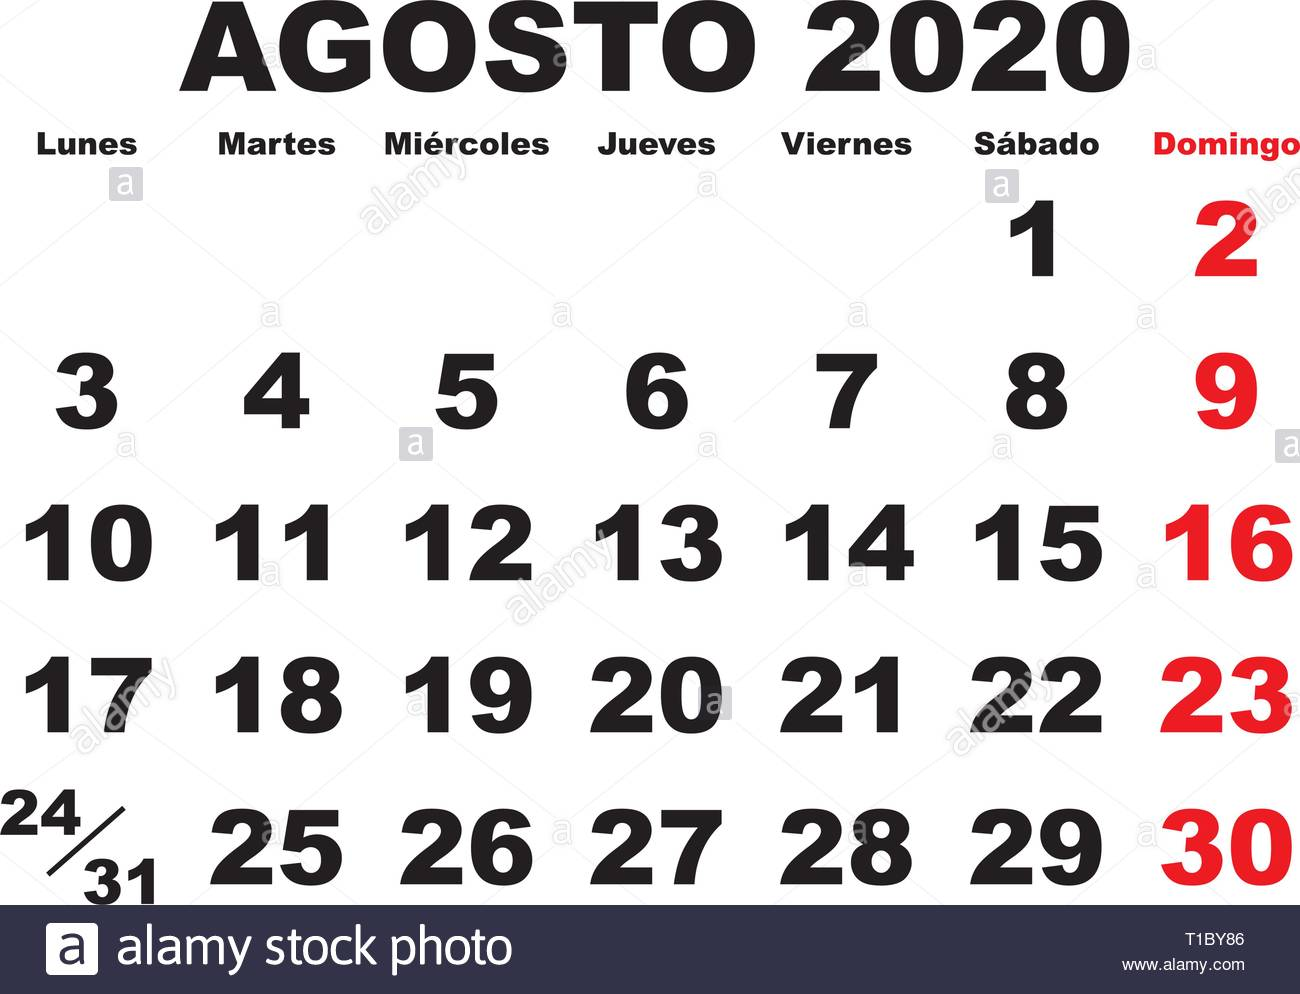 Calendario Agosto 2020.August Month In A Year 2020 Wall Calendar In Spanish Agosto